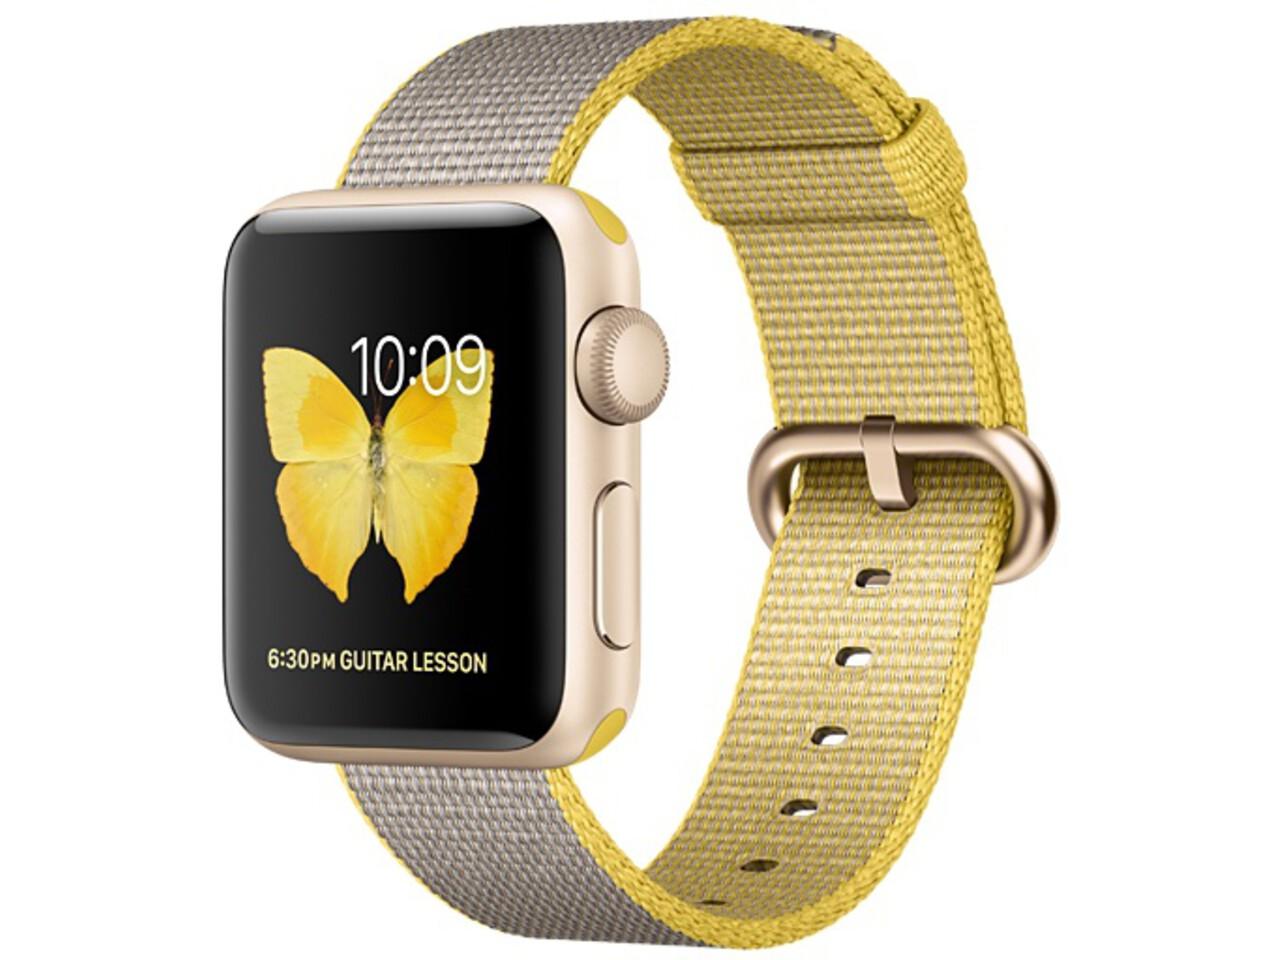 apple watch series 2 38mm gold aluminum yellowlight gray woven nylon band